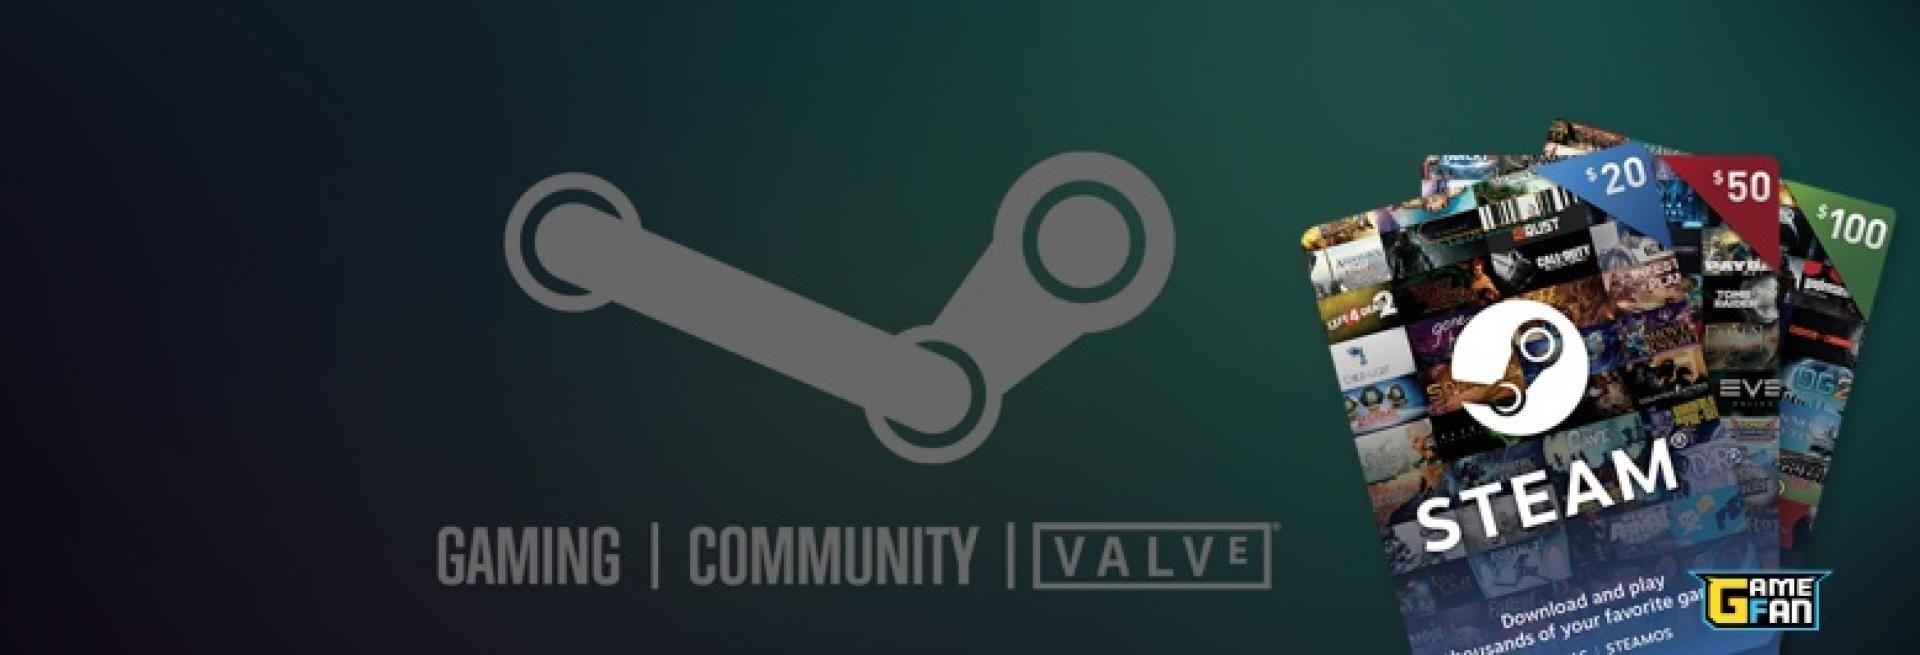 Compra aqui tus tarjetas de Steam